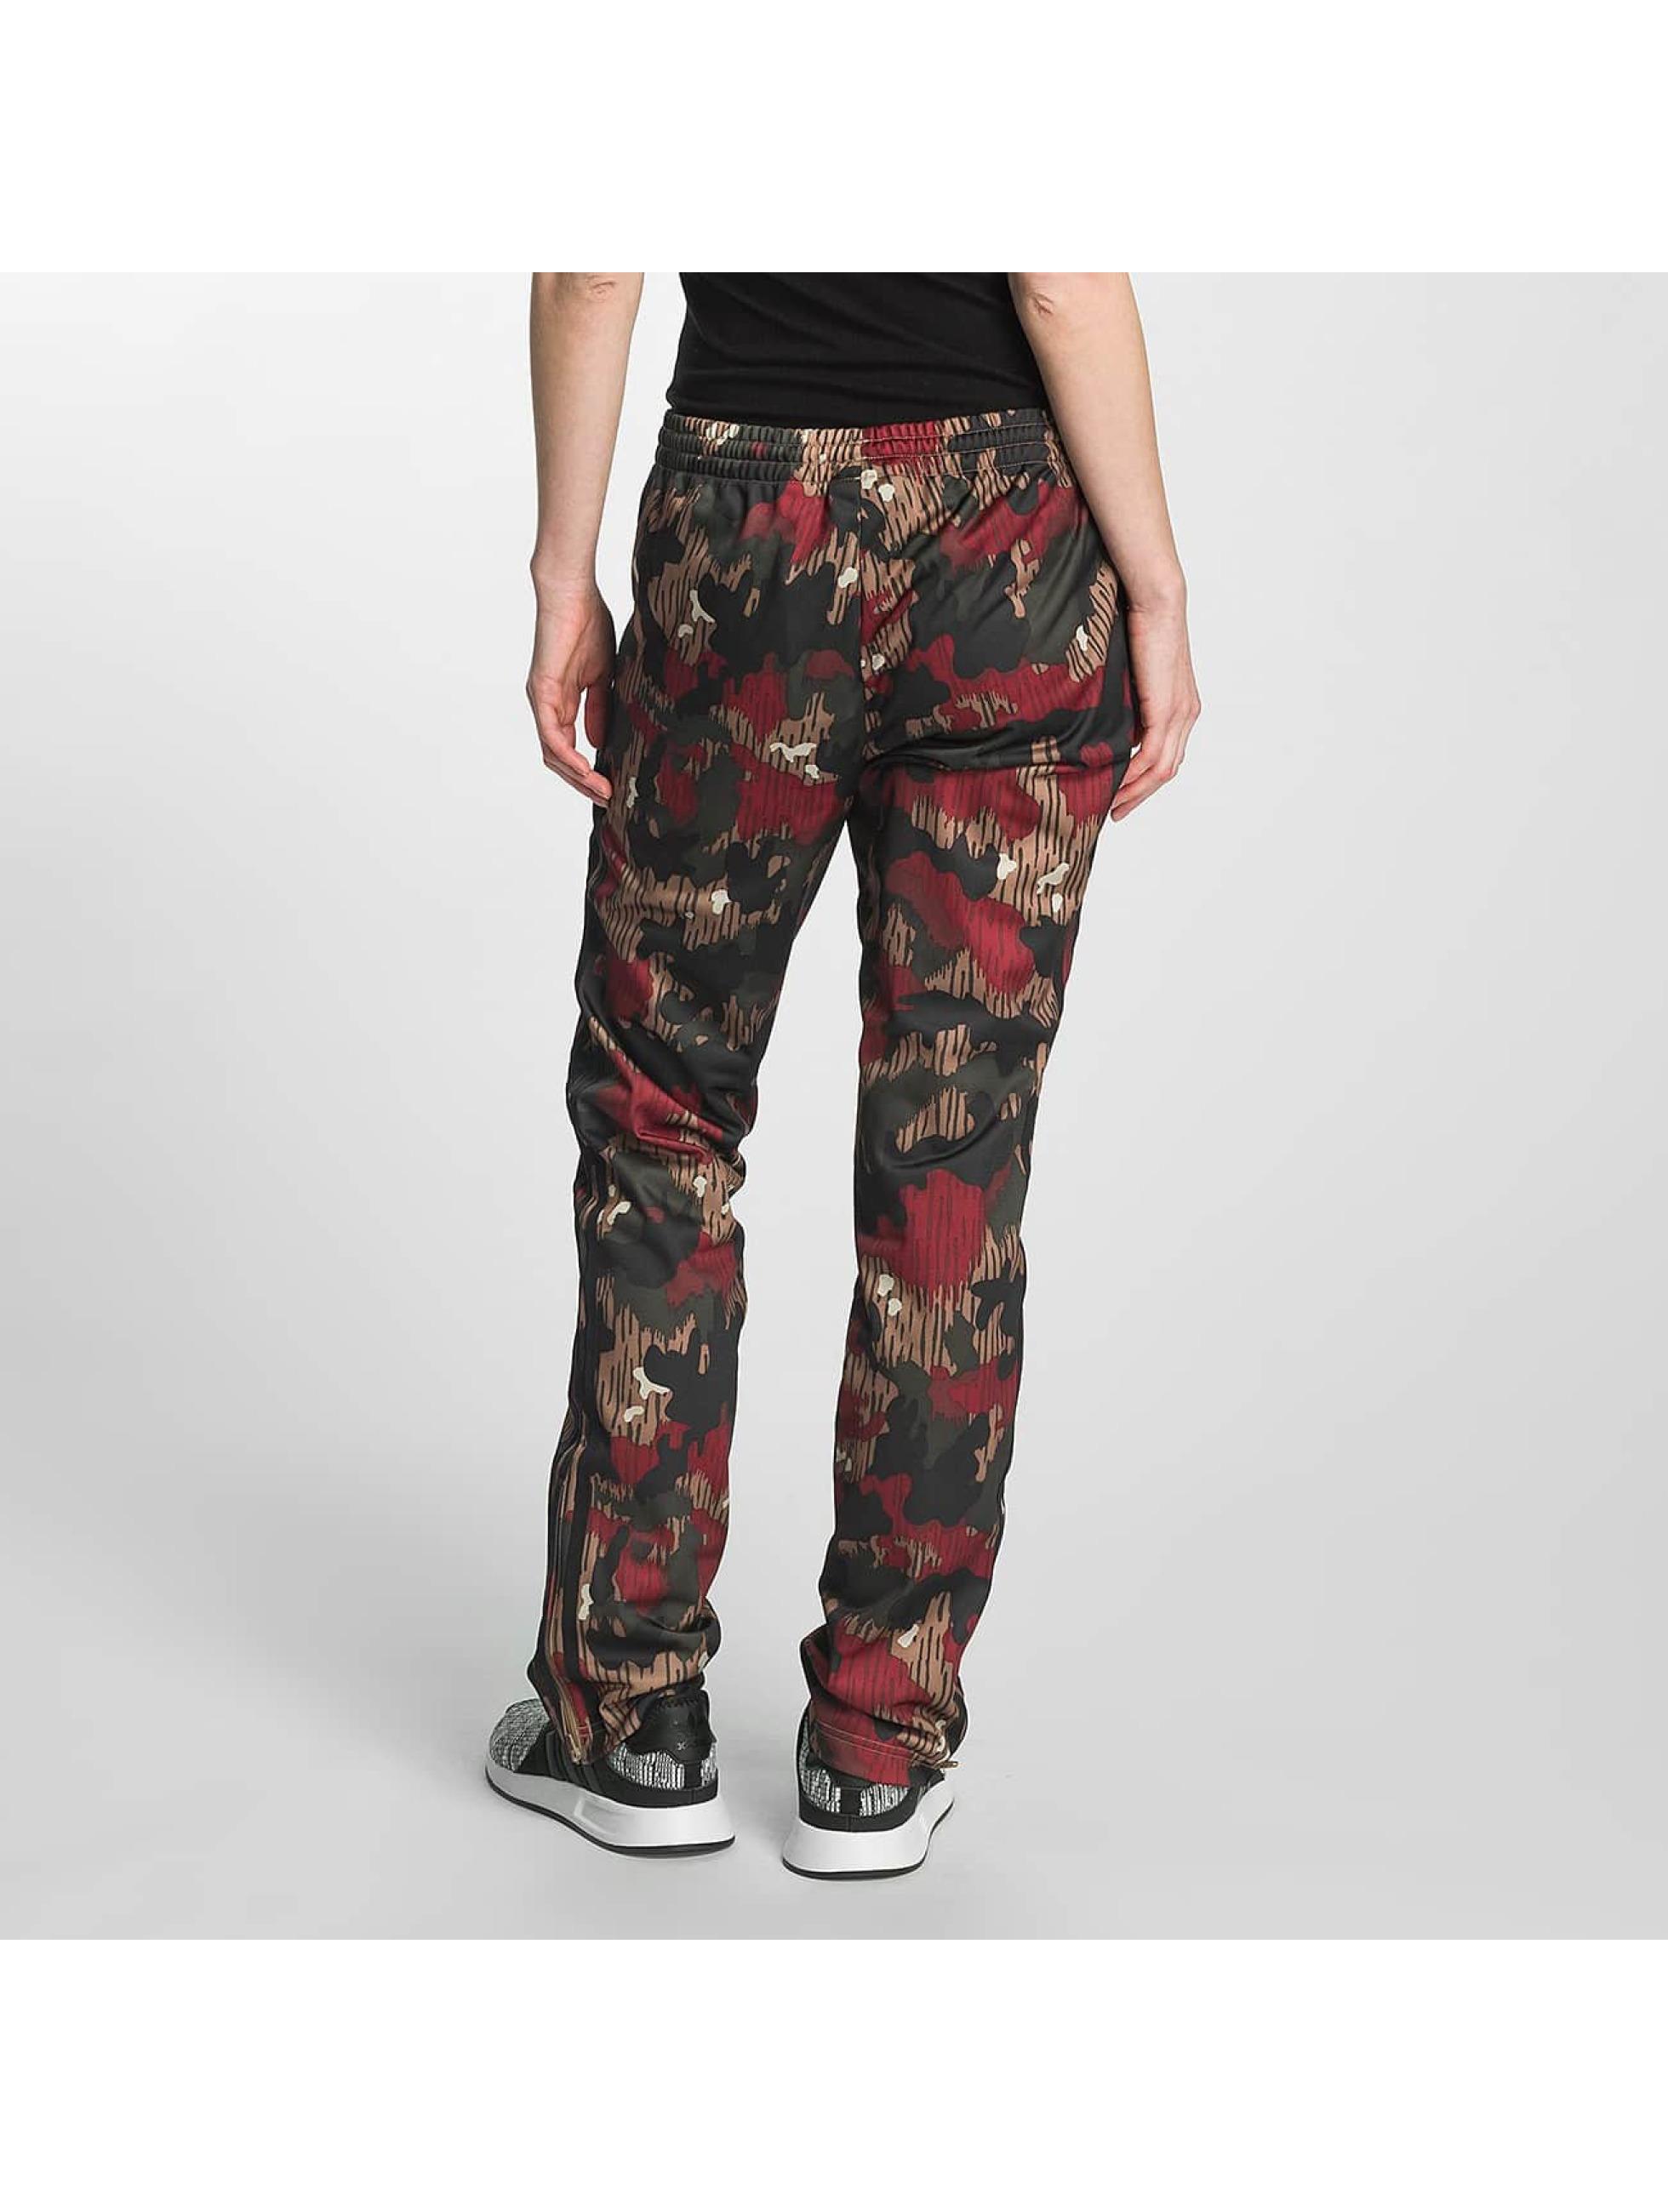 adidas Joggebukser PW Hiking FB Pants kamuflasje